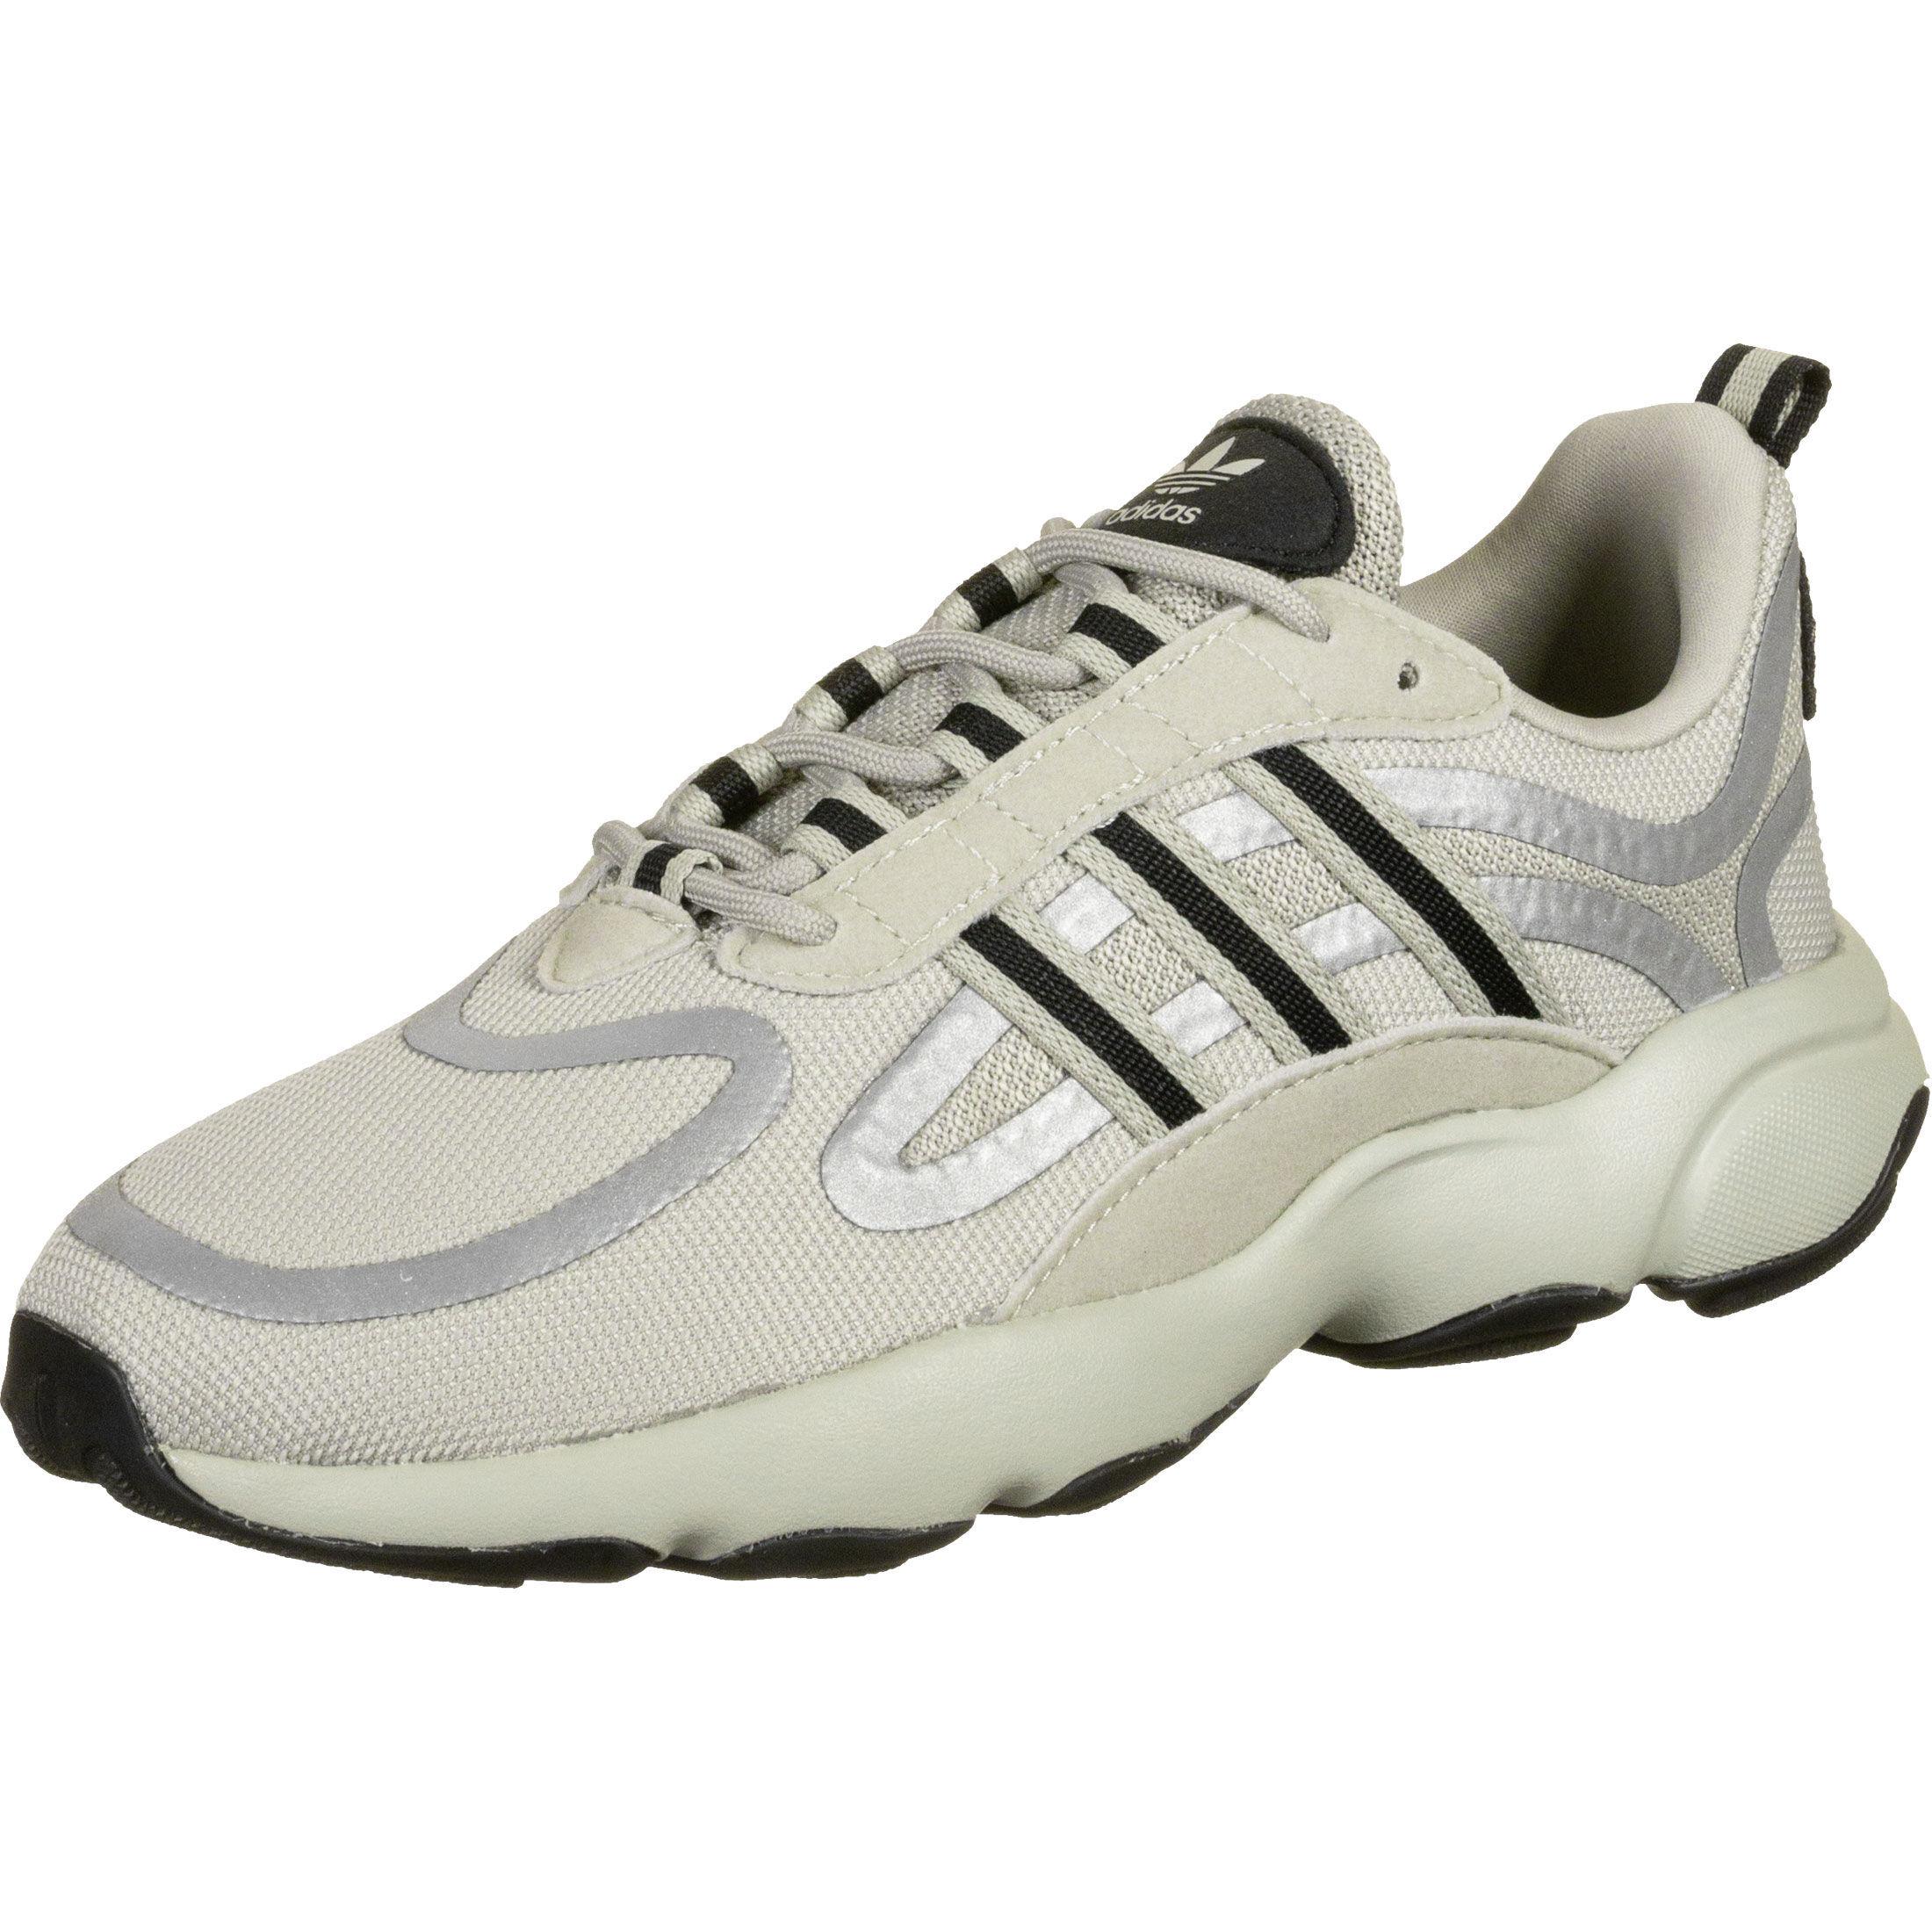 adidas HAIWEE, 48 2/3 EU, gris